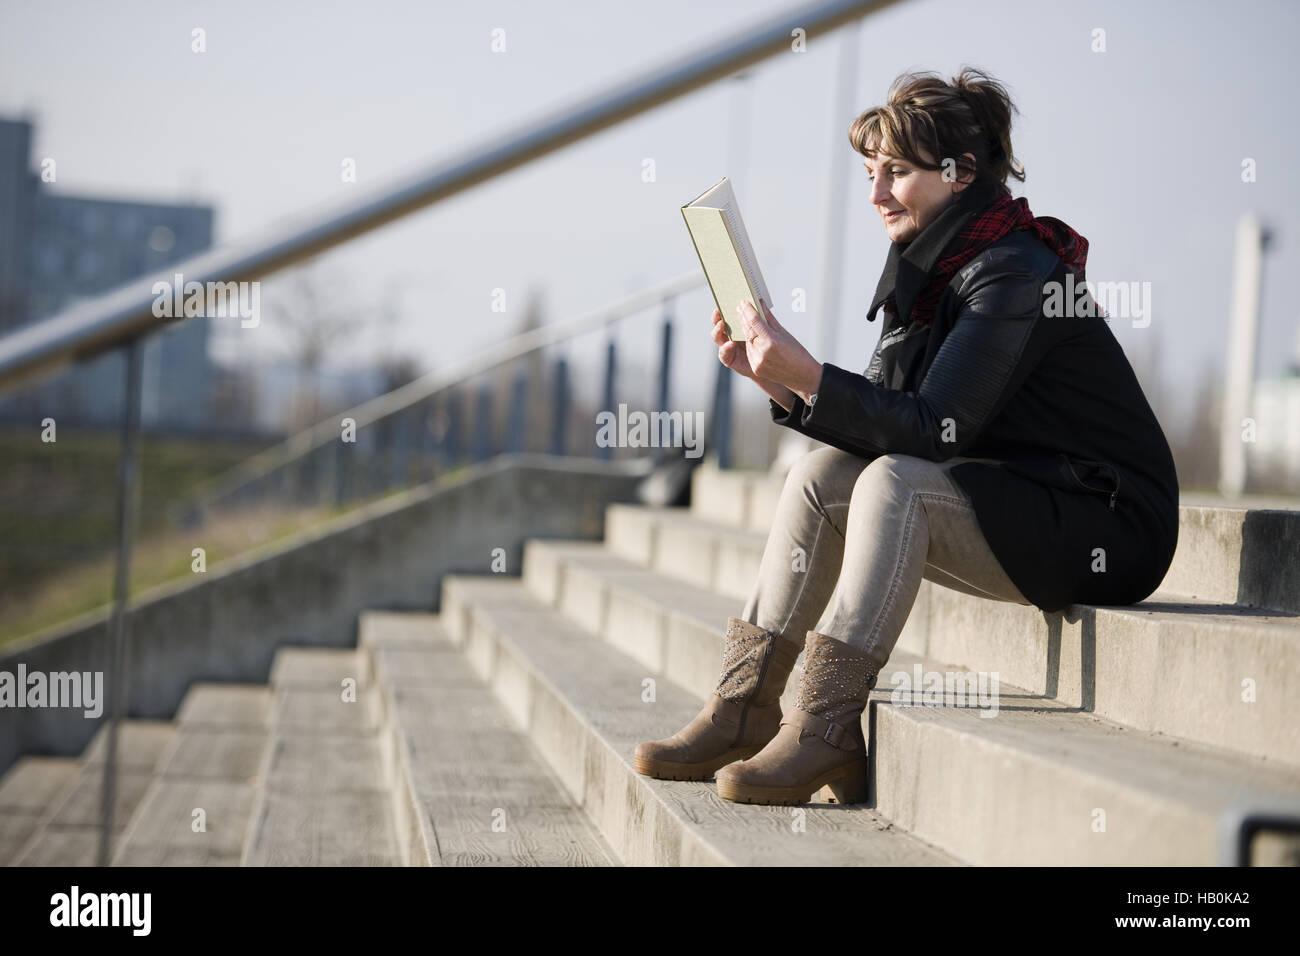 Frau liest ein book_horizontal Stockbild